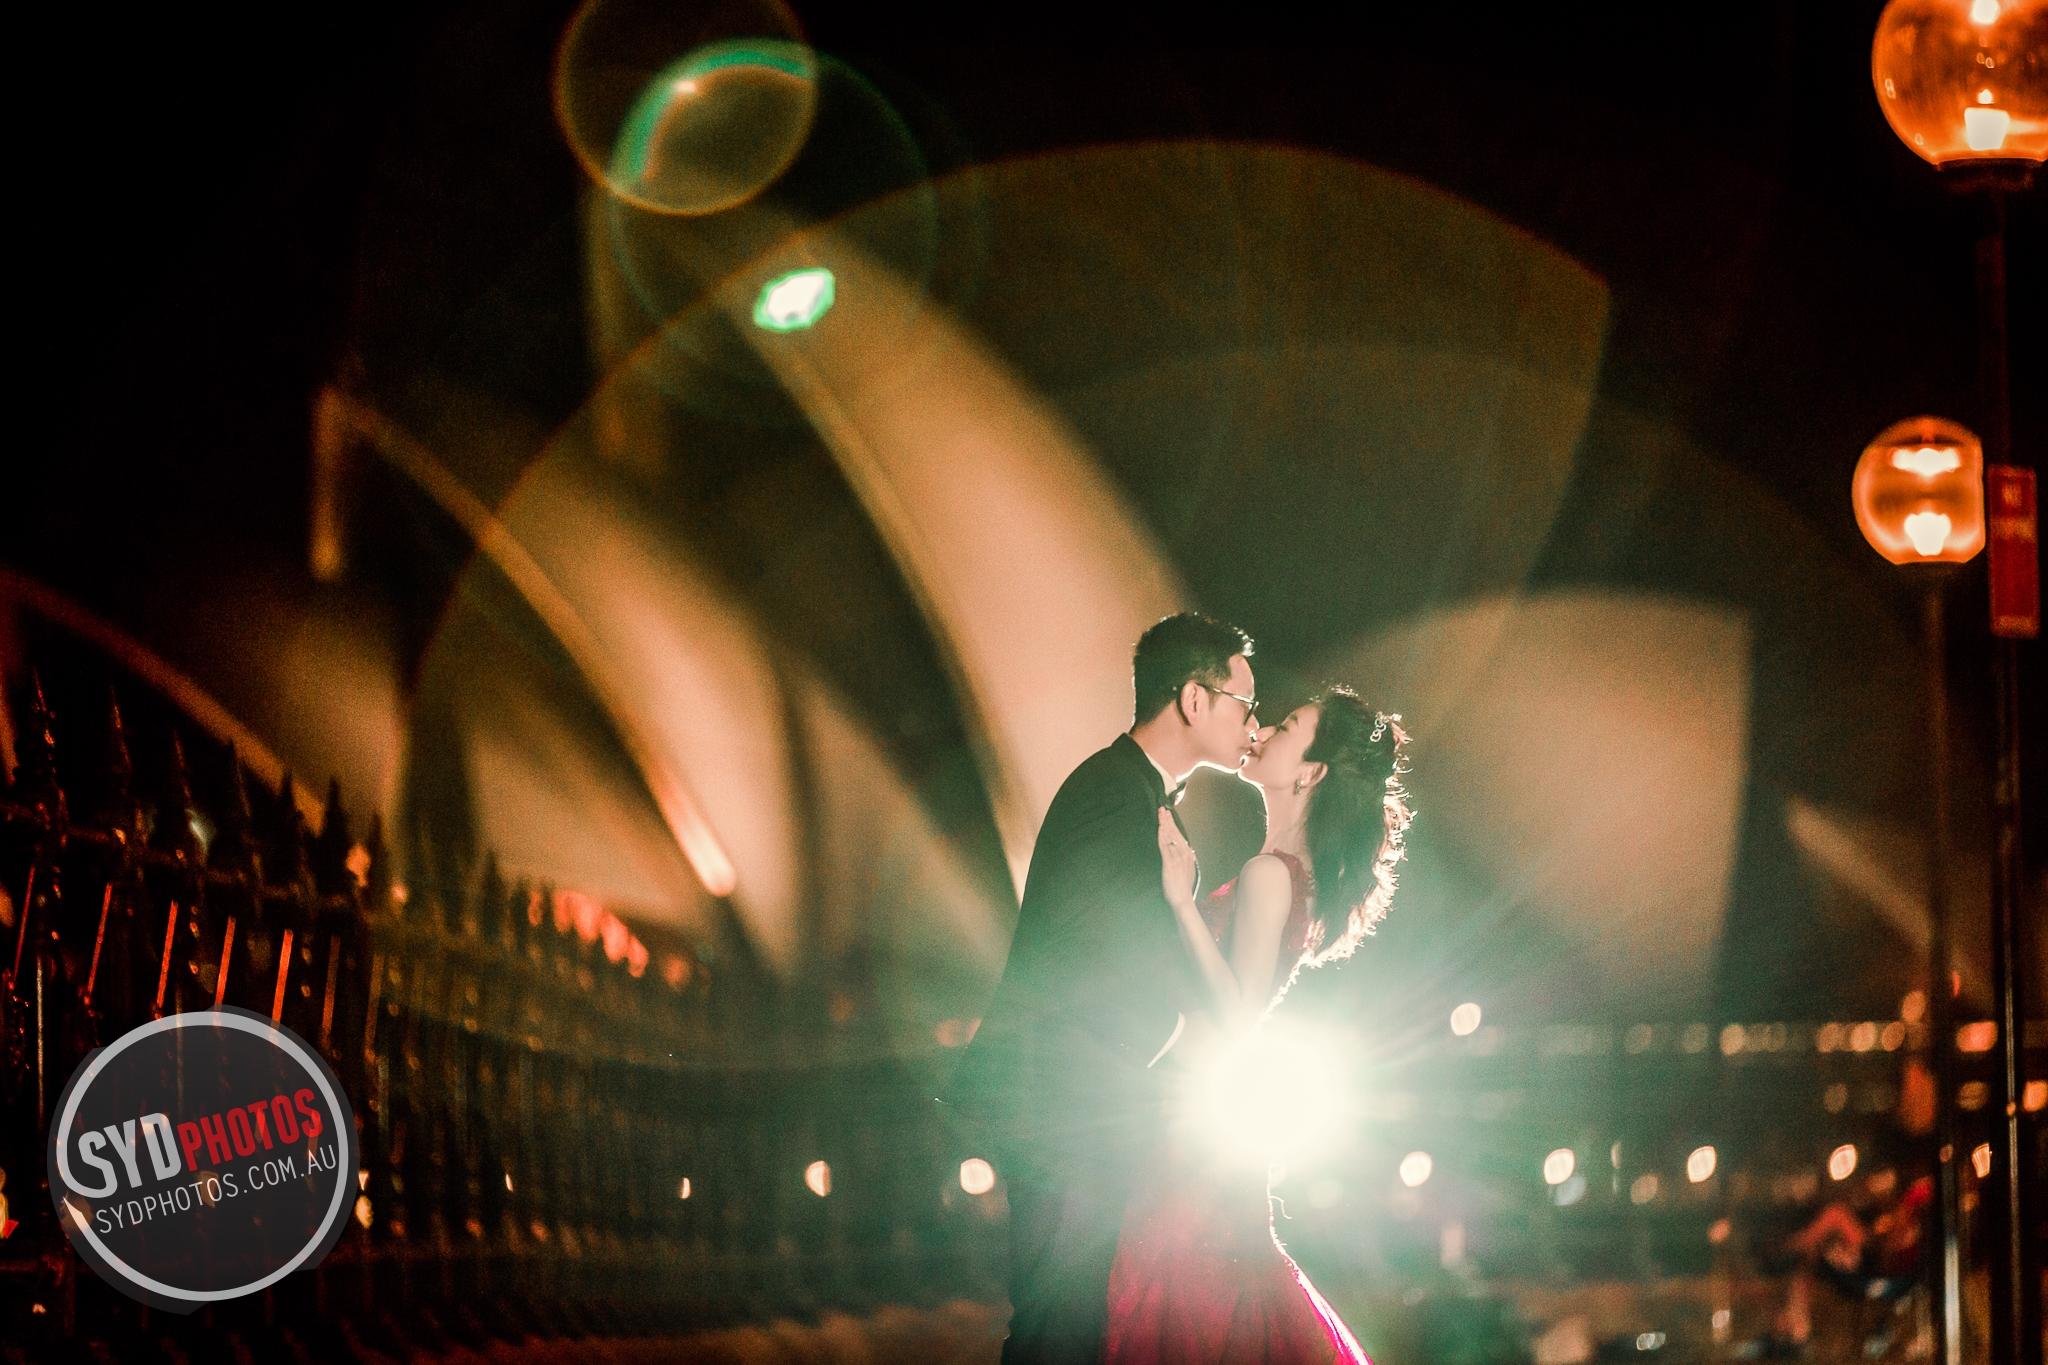 ID-108068-Frances Wang-Prewedding-悉尼婚纱摄影